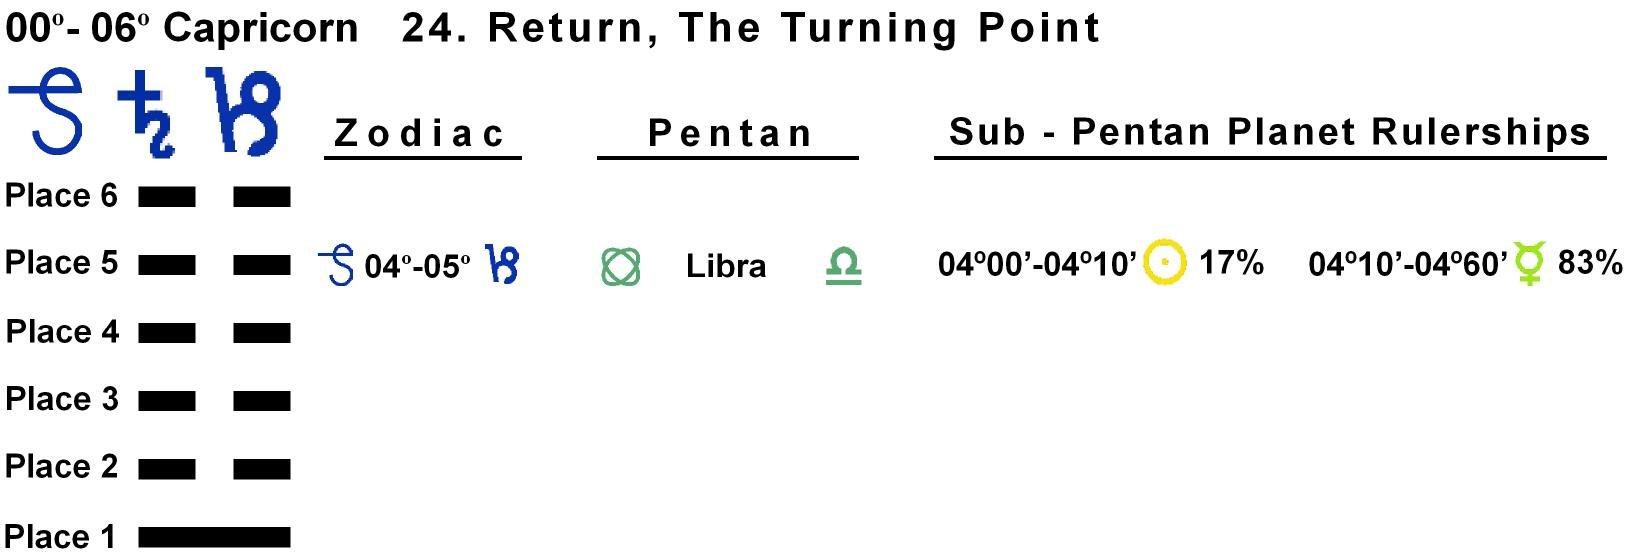 Pent-lines-10CP 04-05 Hx-24 Return